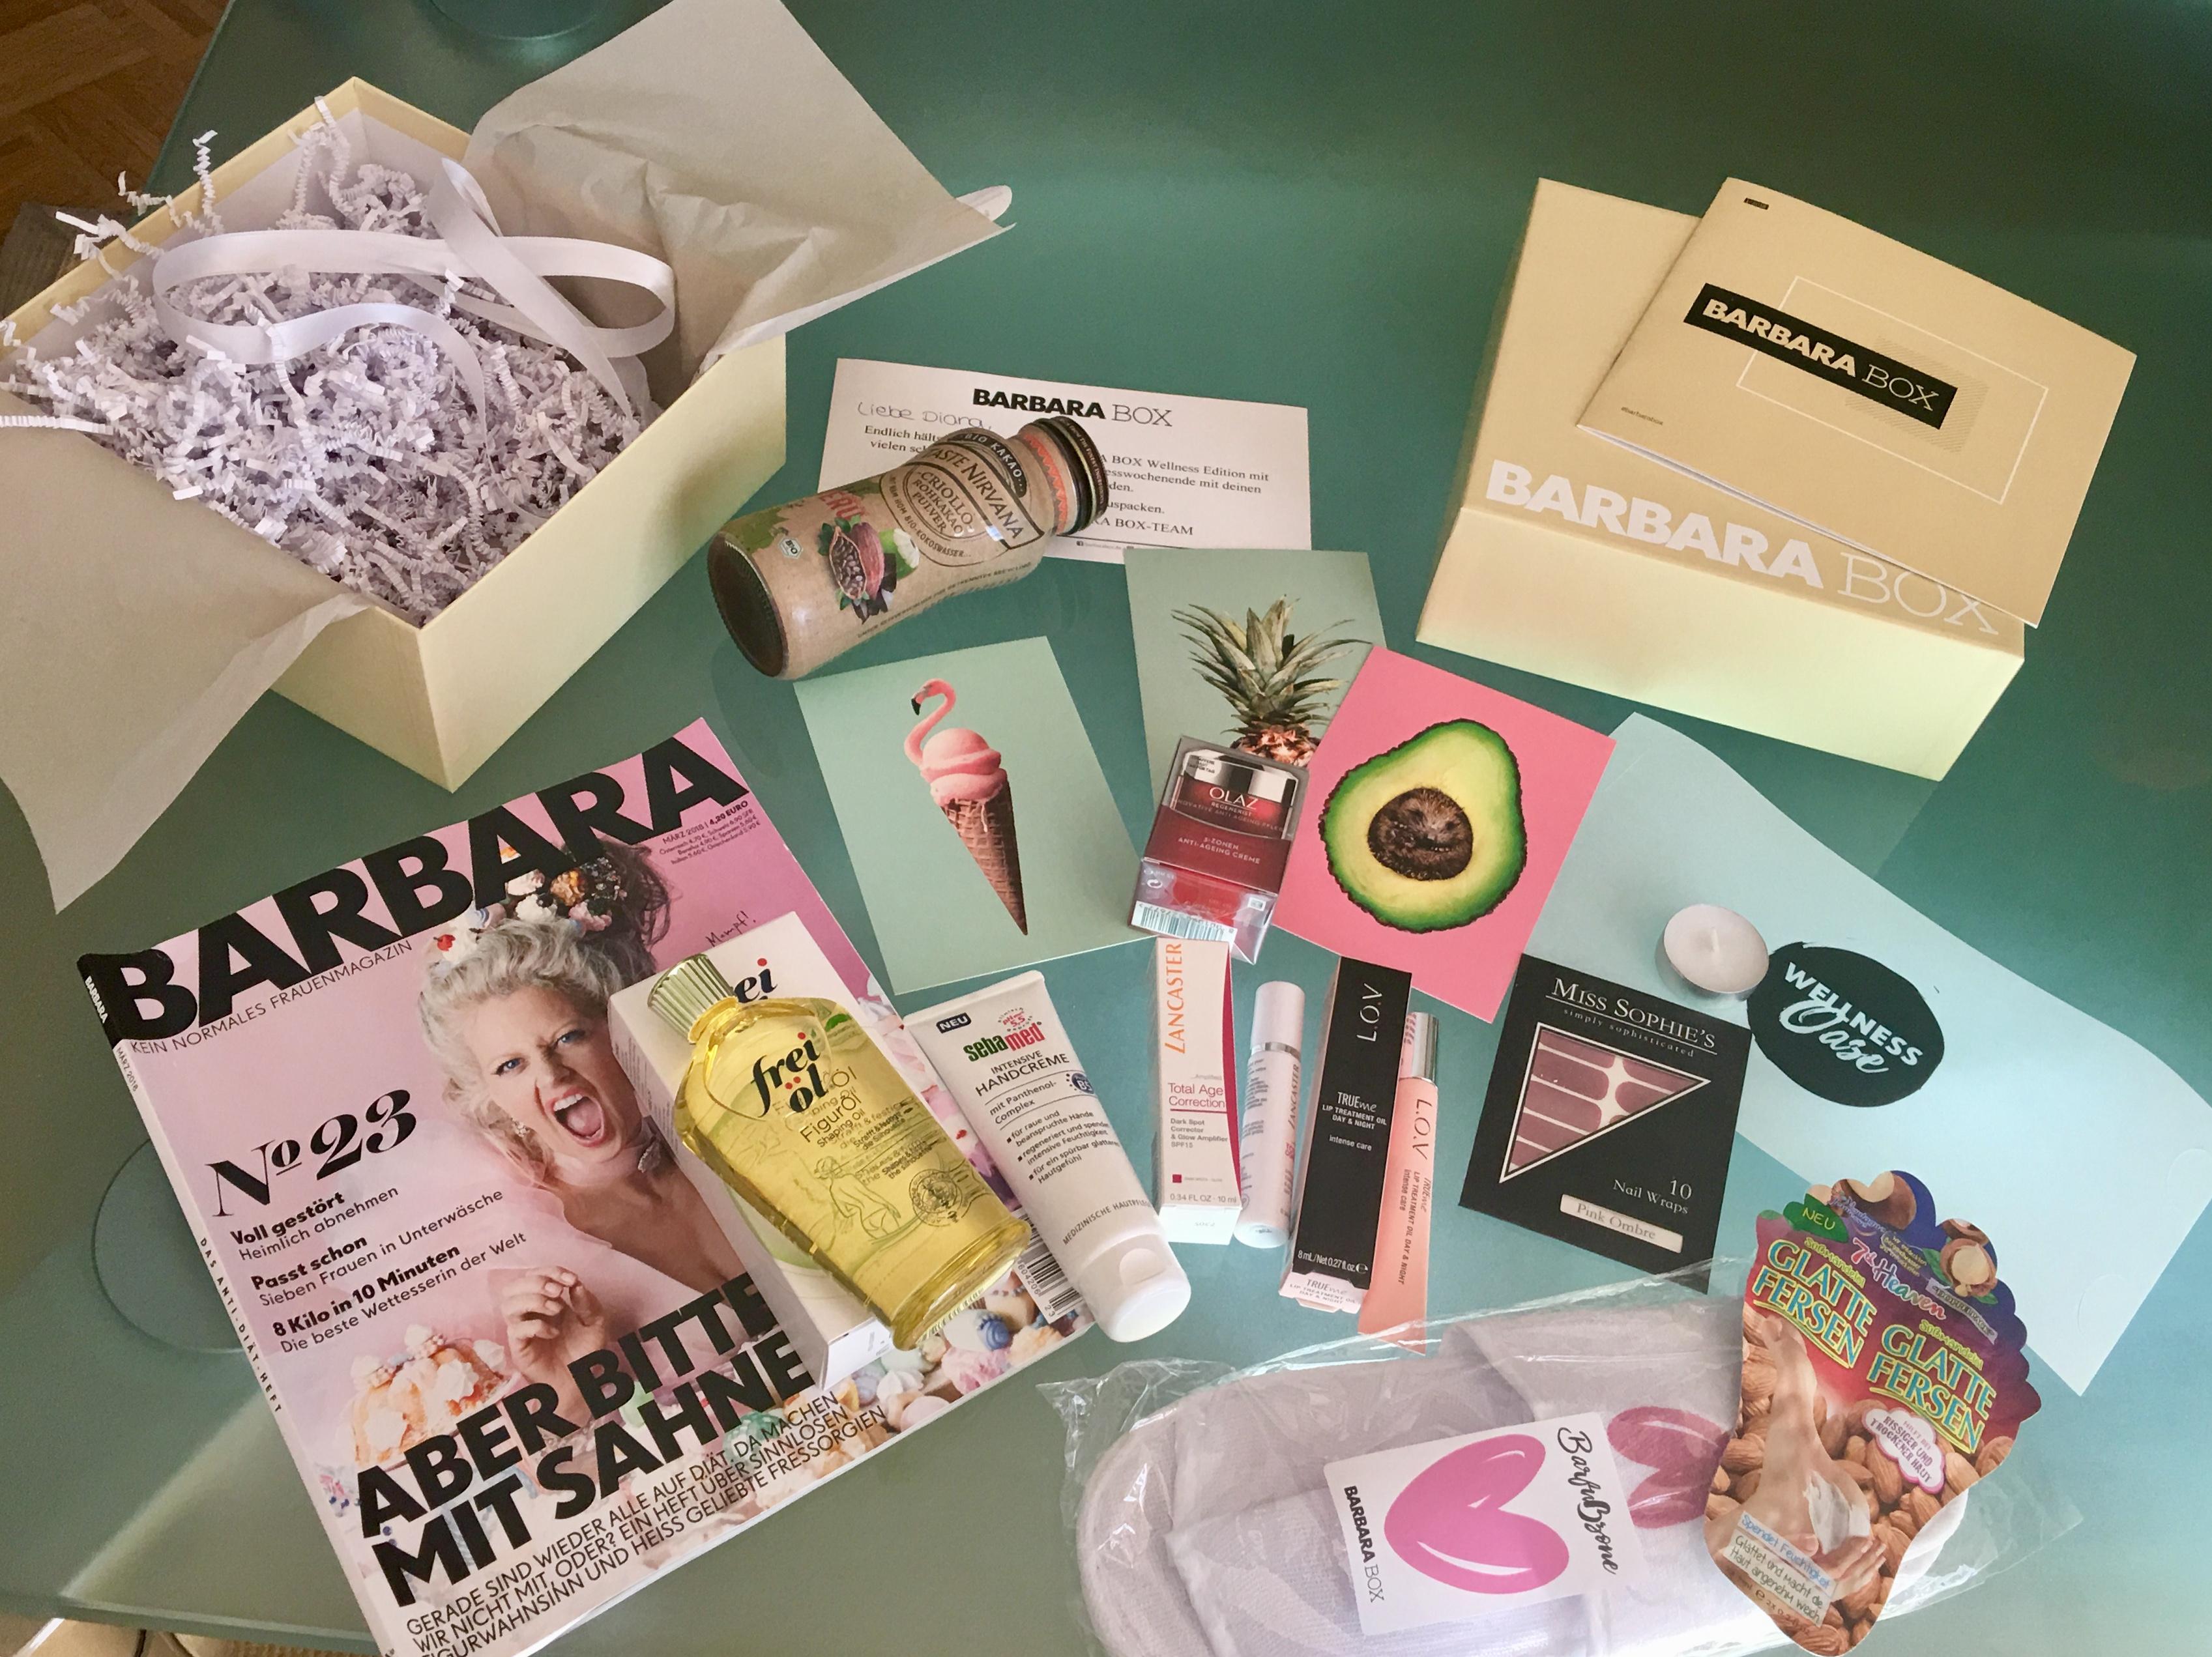 Barbara_Box_01_2018